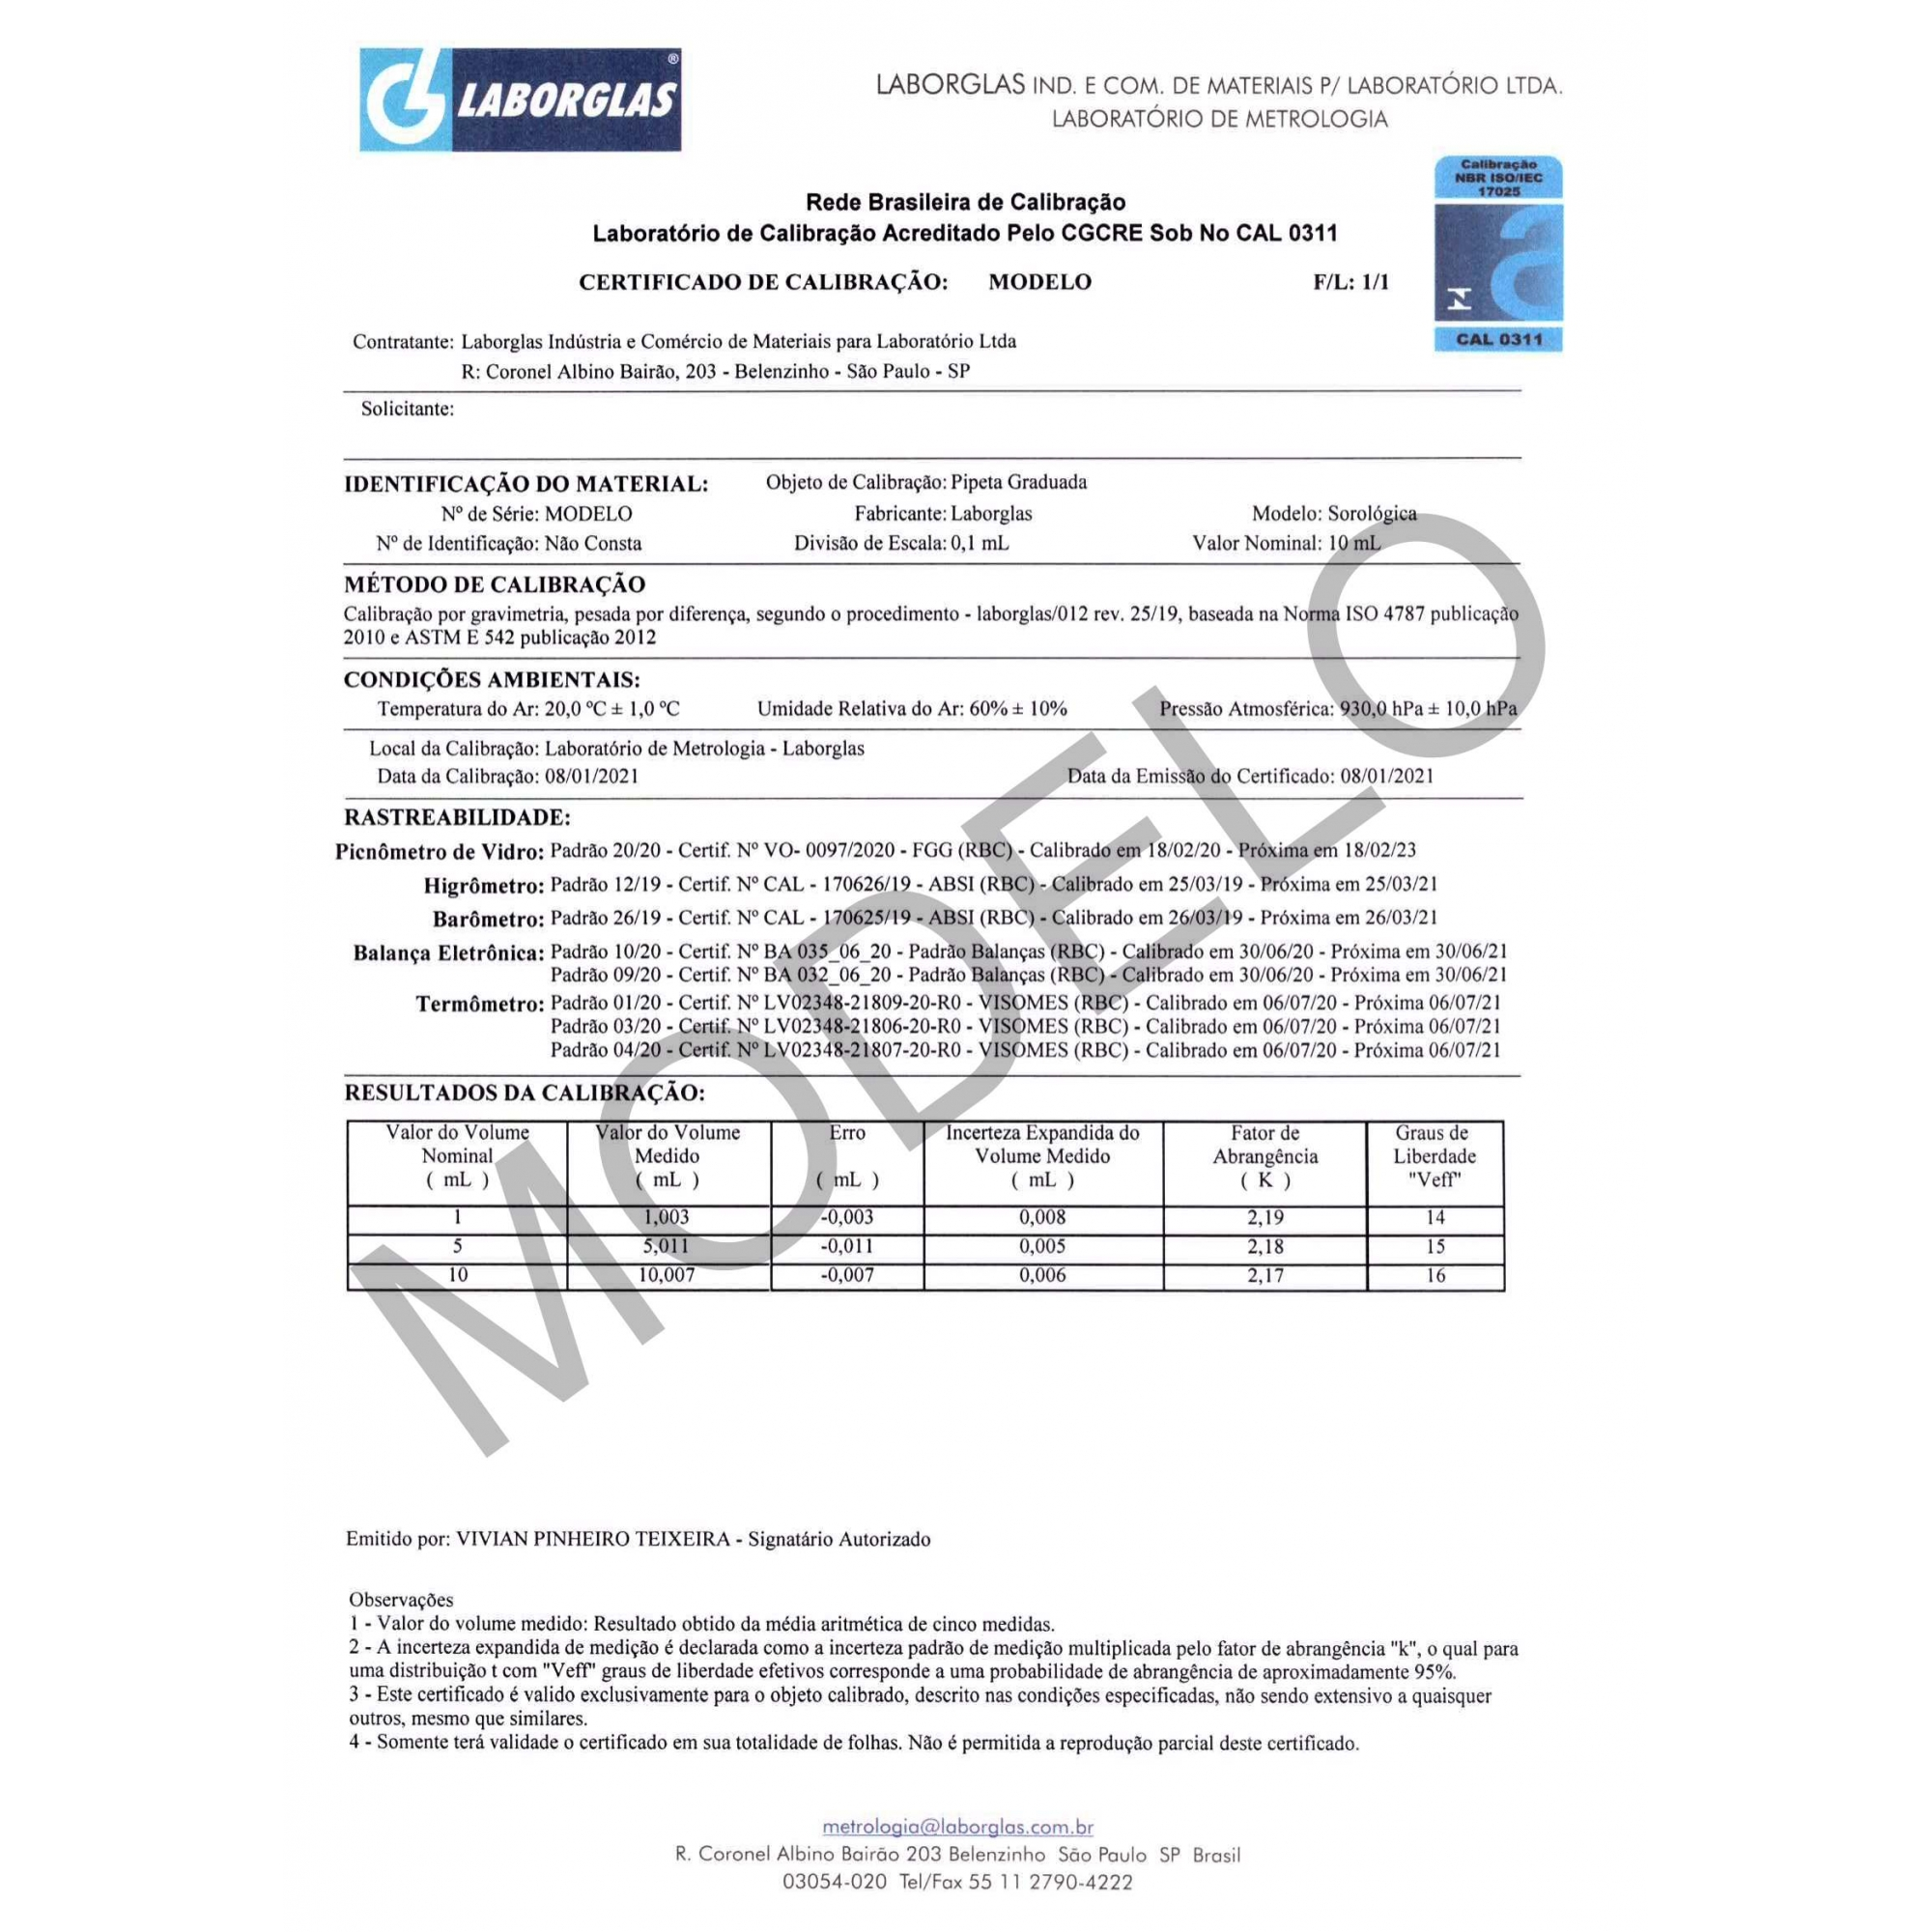 PIPETA GRADUADA SOROLÓGICA ESGOTOTAMENTO TOTAL 10 ML 1/10 CLASSE A COM CERTIFICADO RBC - Laborglas - Cód. 9443611-R